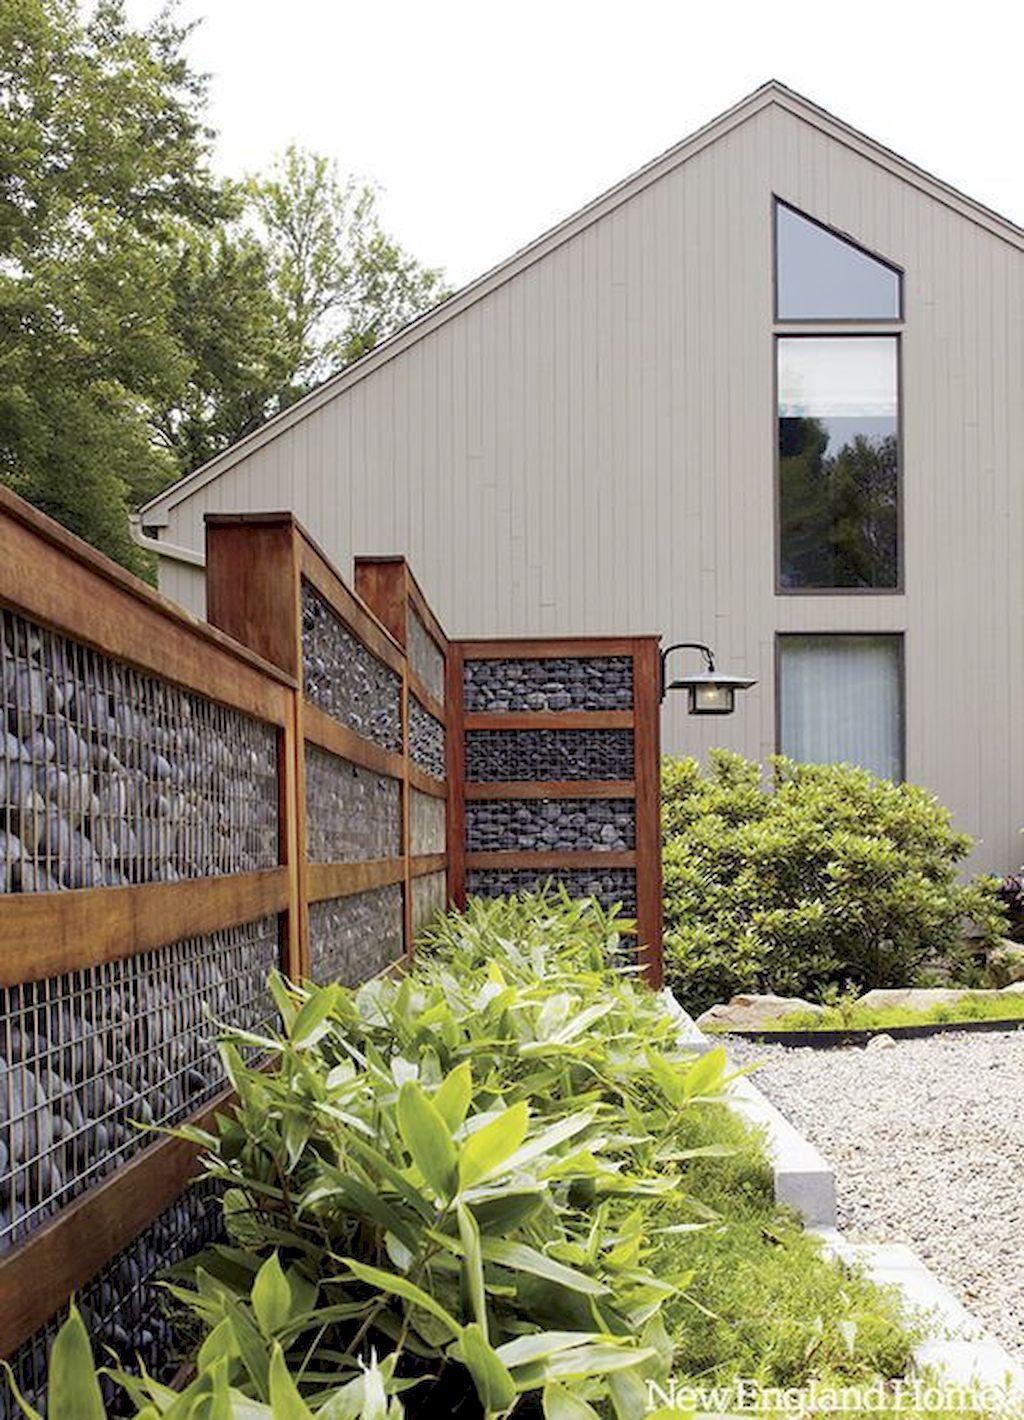 Awesome 50 Fabulous Gabion Fence Design For Garden Landscaping Ideas Source Link Https Doitdecor Co 50 F Backyard Fences Fence Design Privacy Fence Designs